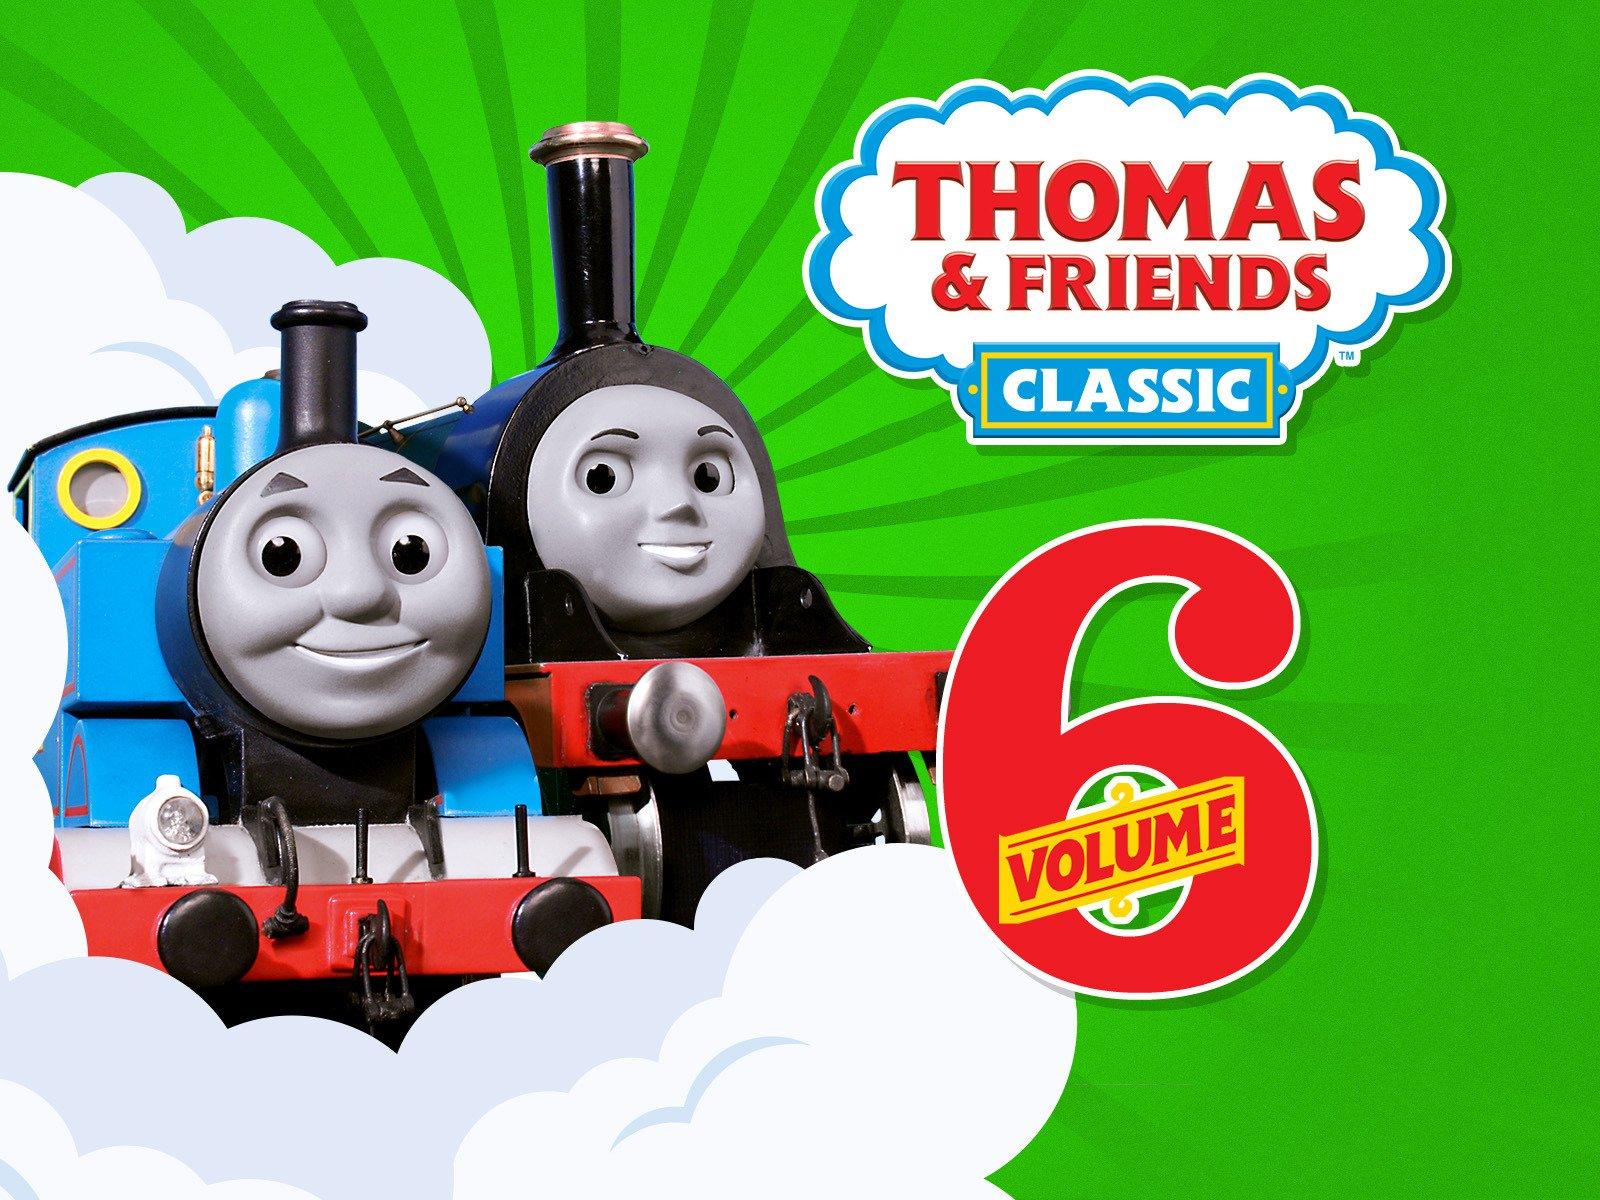 Thomas & Friends Classic Volume 6